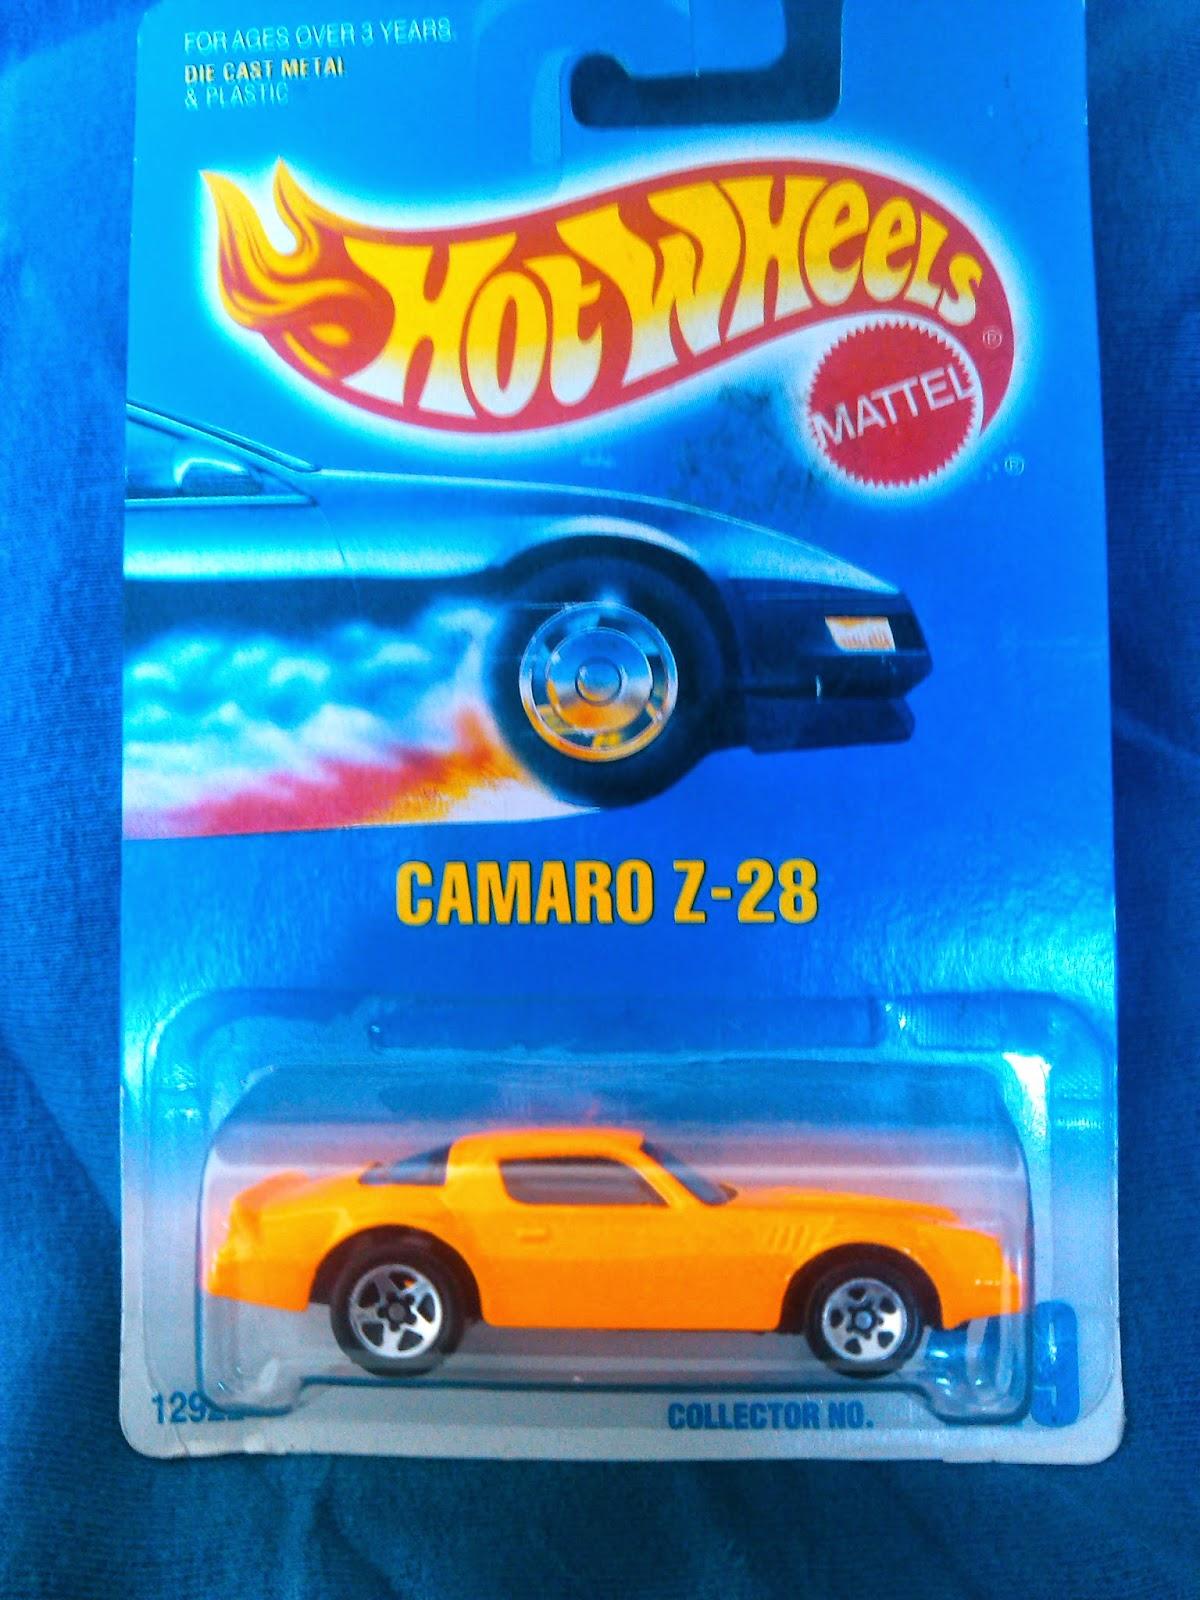 Colección Chevrolet Camaro en Blister Camaro+Z-28+1996+Hot+Wheels+%23449